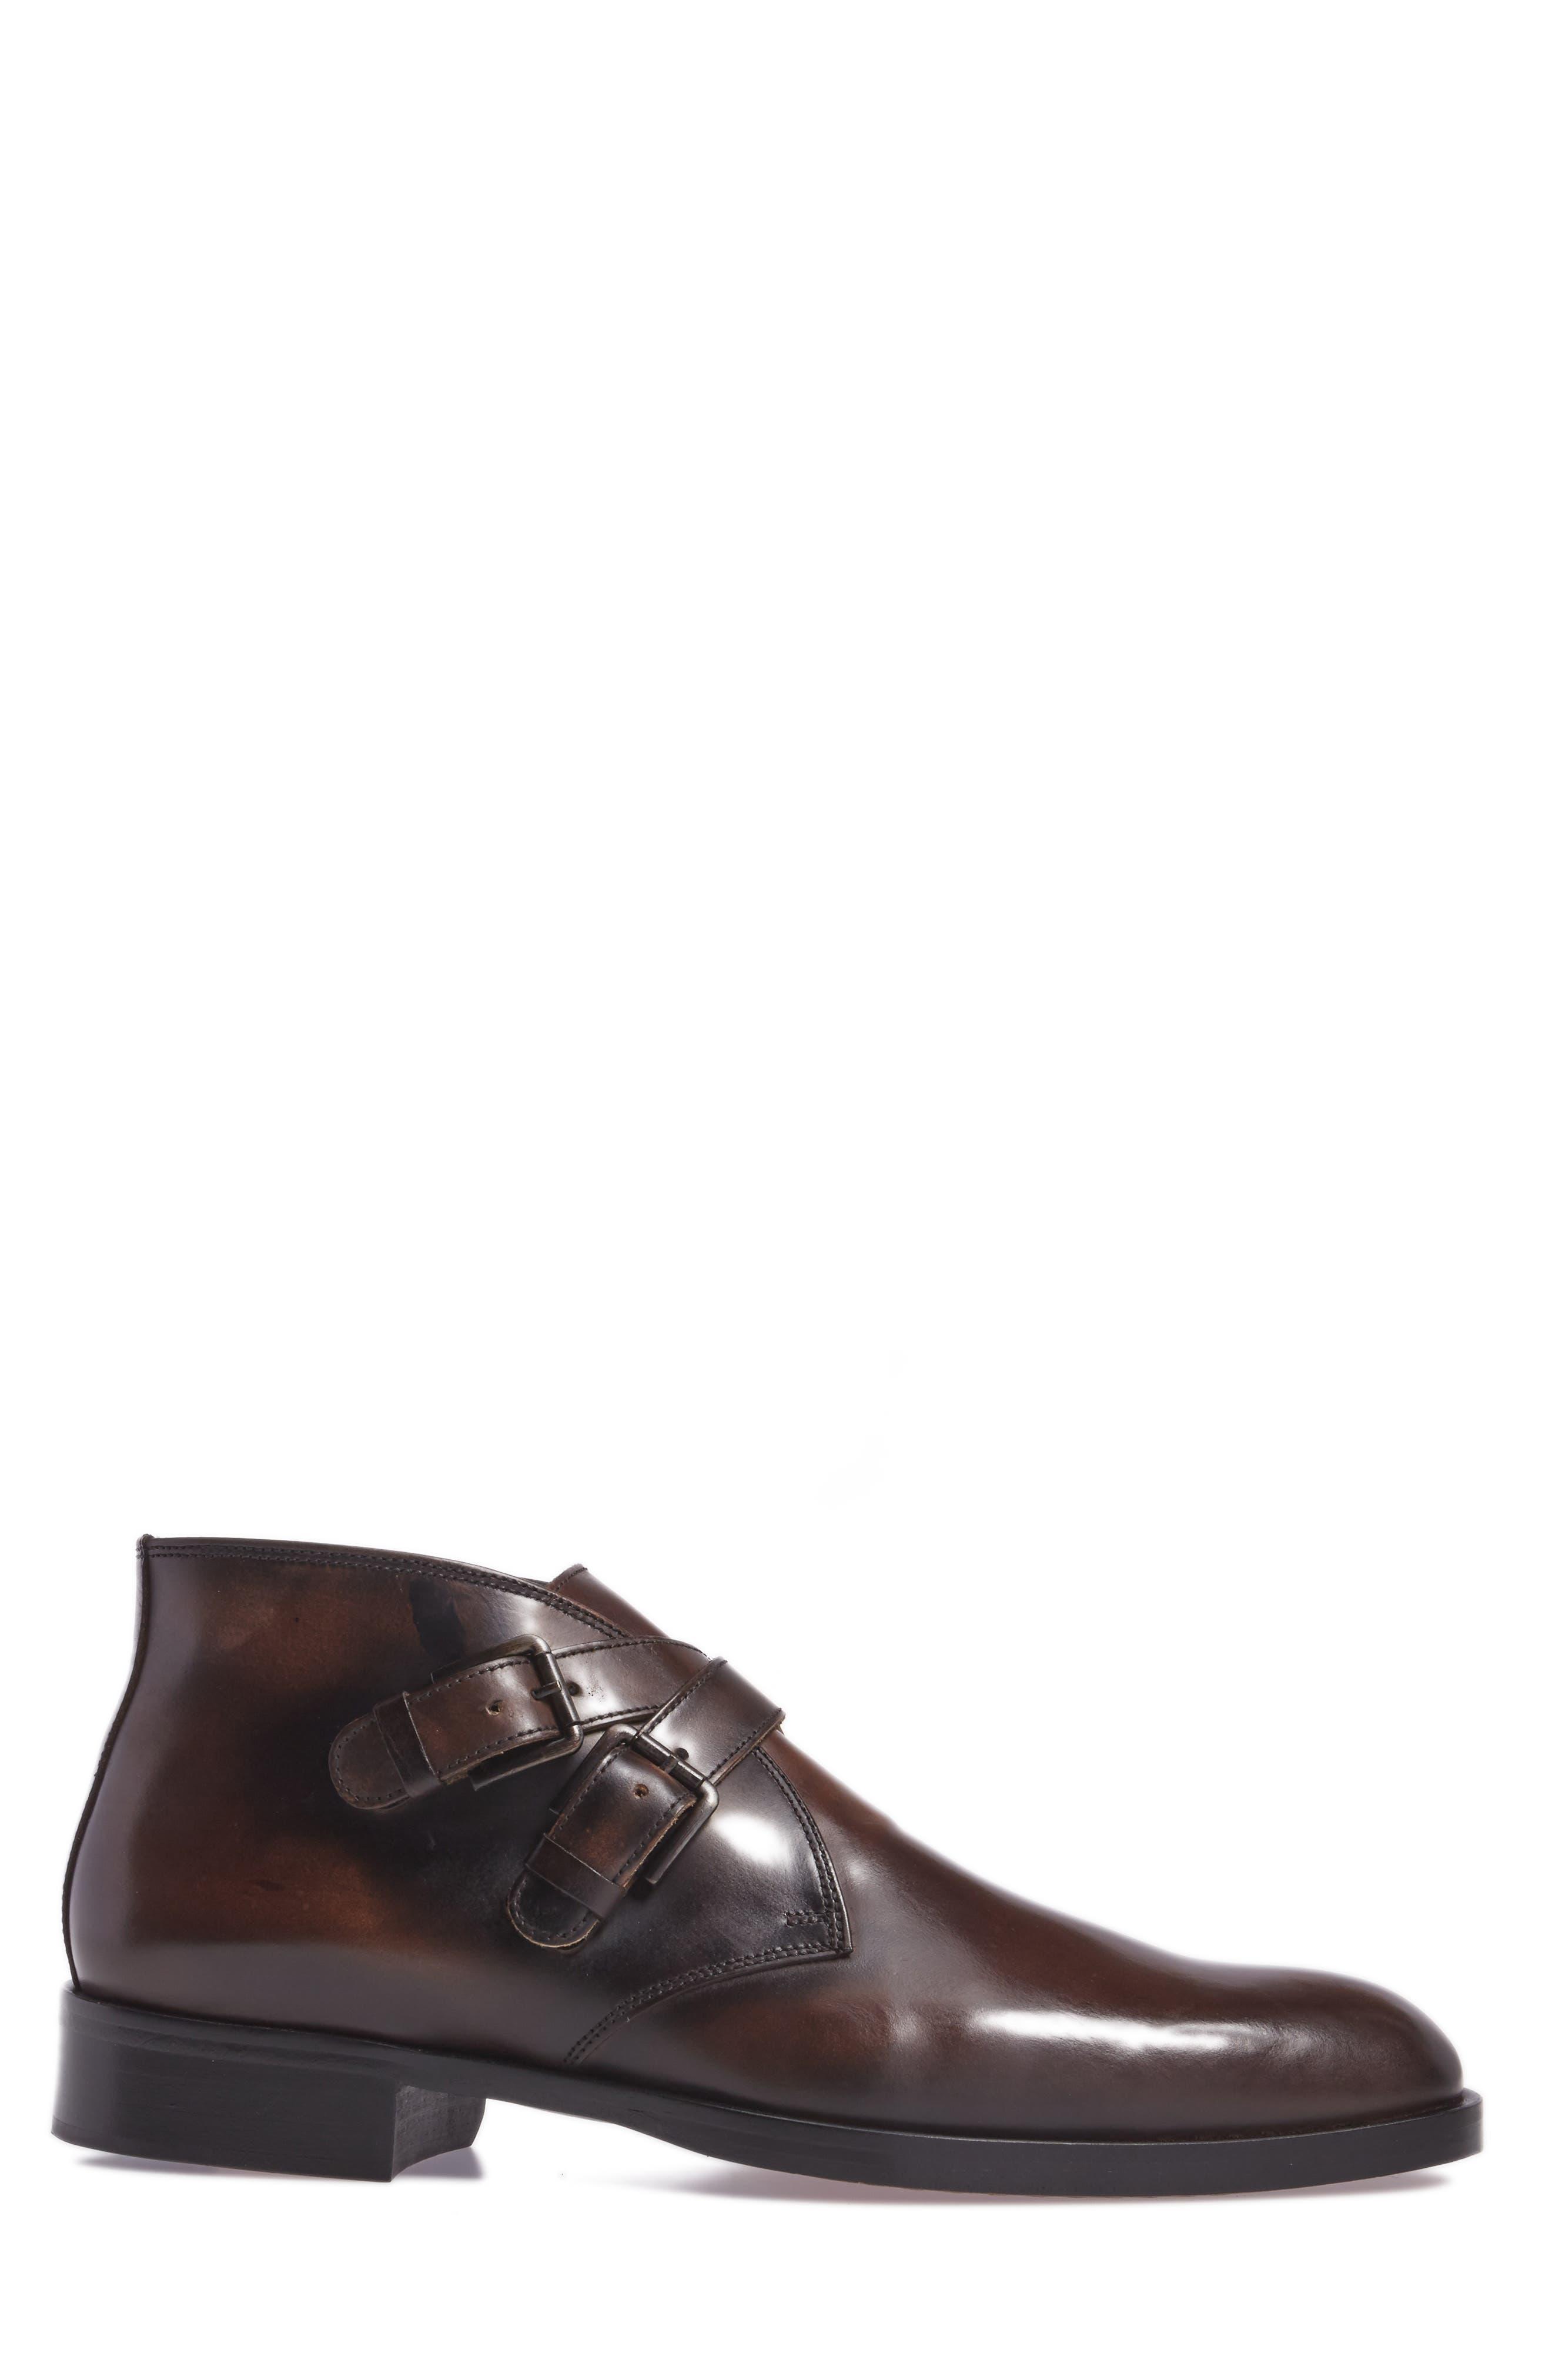 Donald J Pliner Zigor Double Monk Strap Boot,                             Alternate thumbnail 3, color,                             200